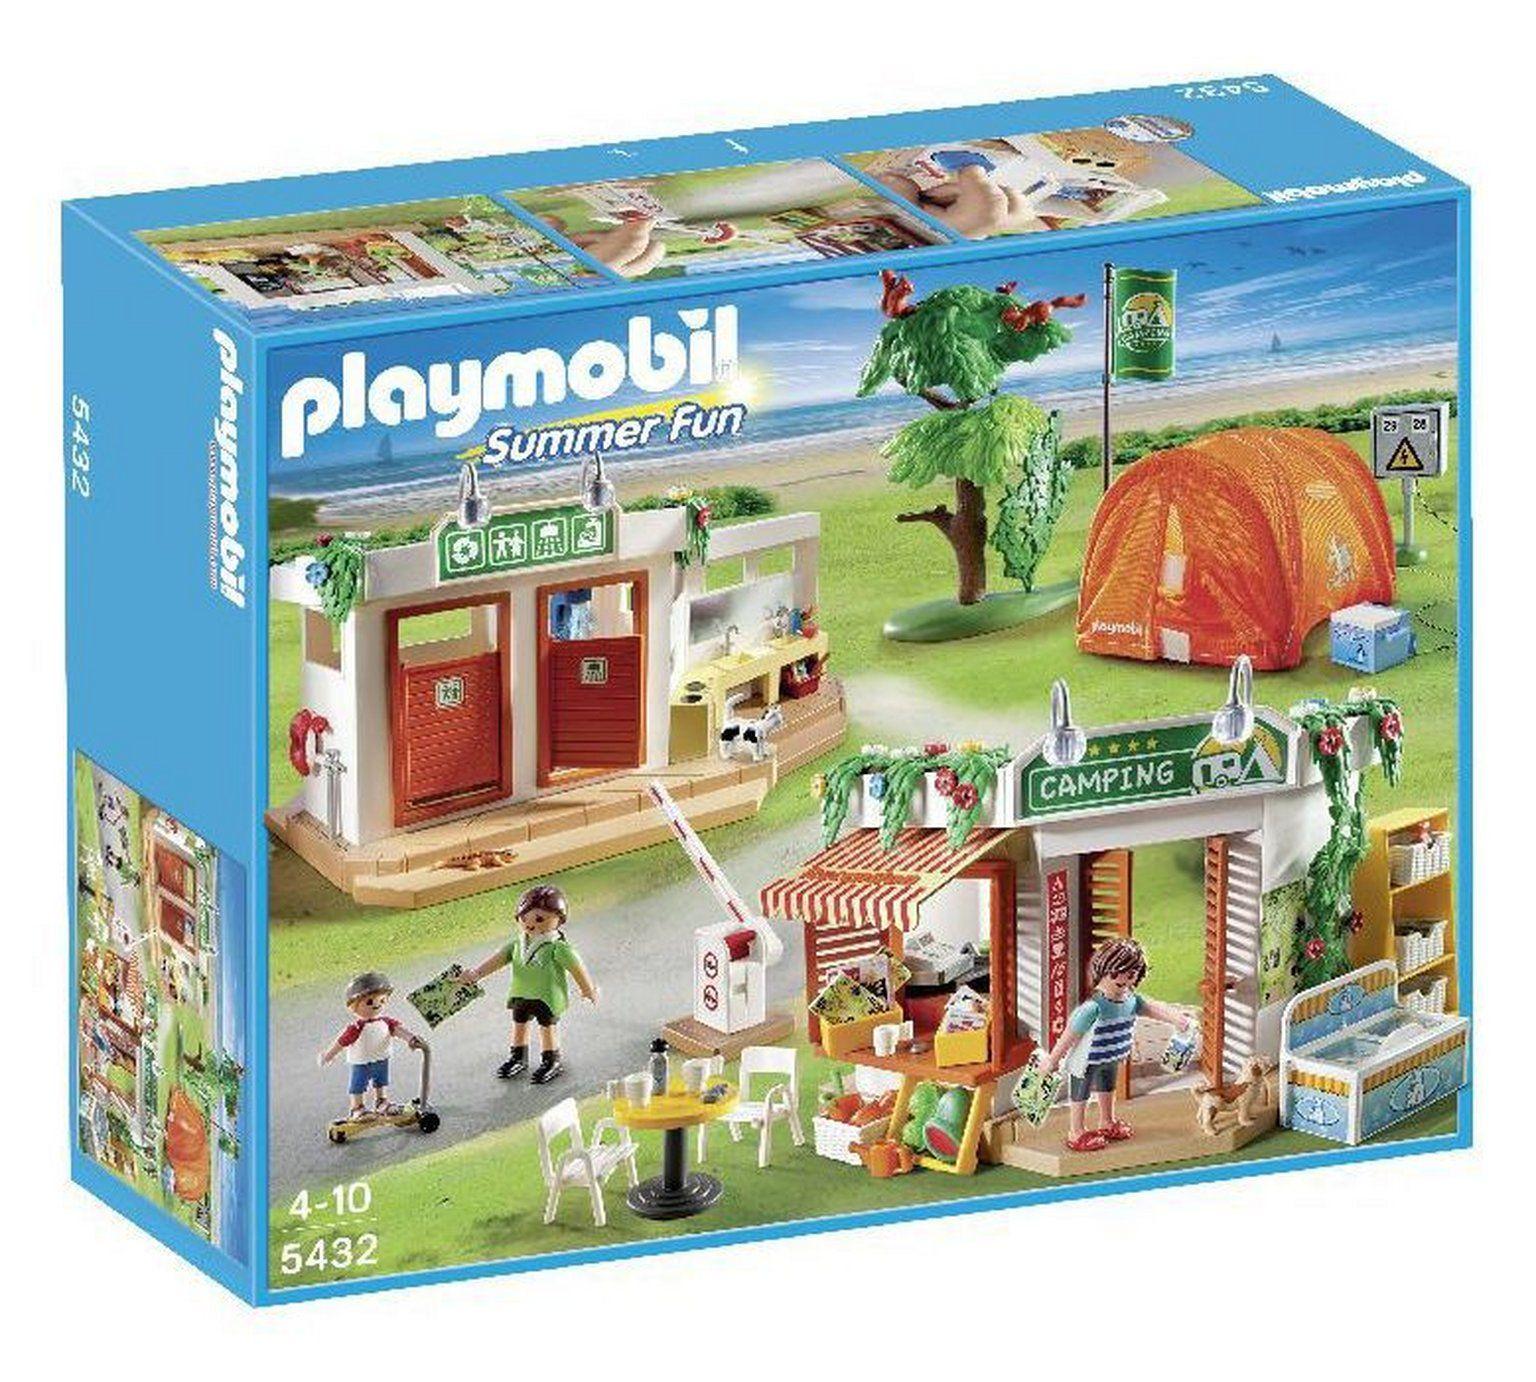 Playmobil 5432 Summer Fun Camp Site At Argos Co Uk Visit